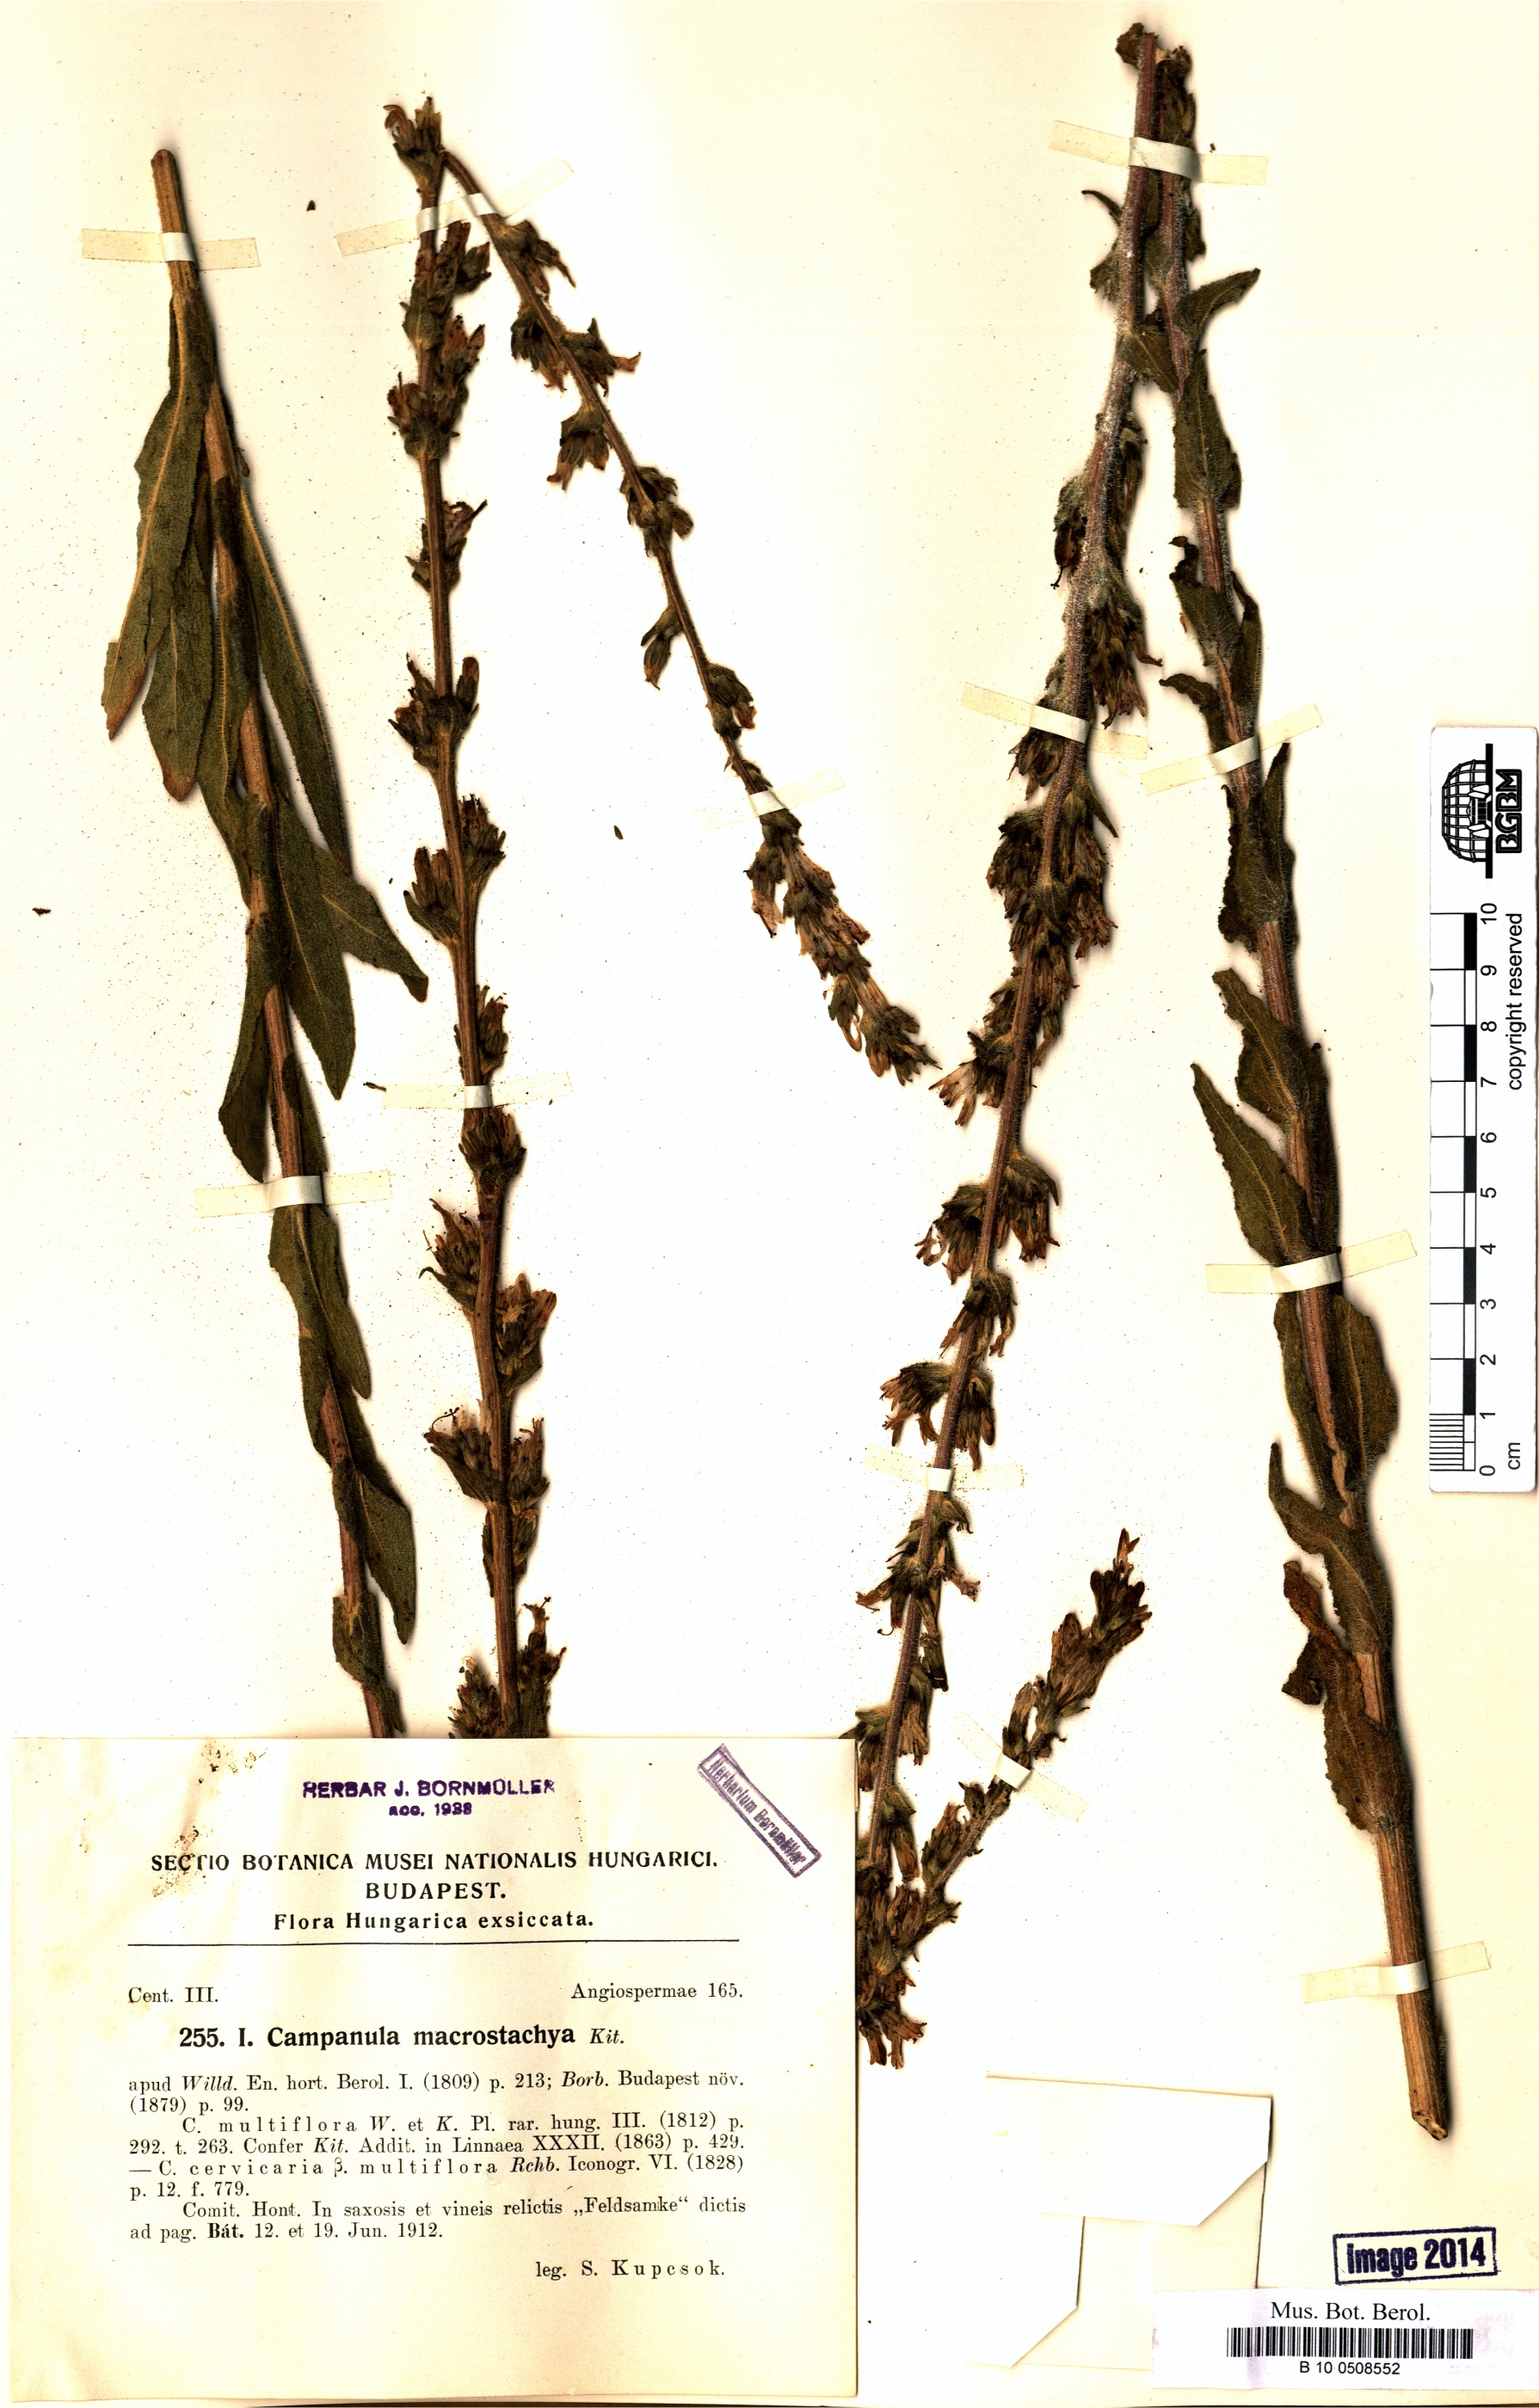 http://ww2.bgbm.org/herbarium/images/B/10/05/08/55/B_10_0508552.jpg